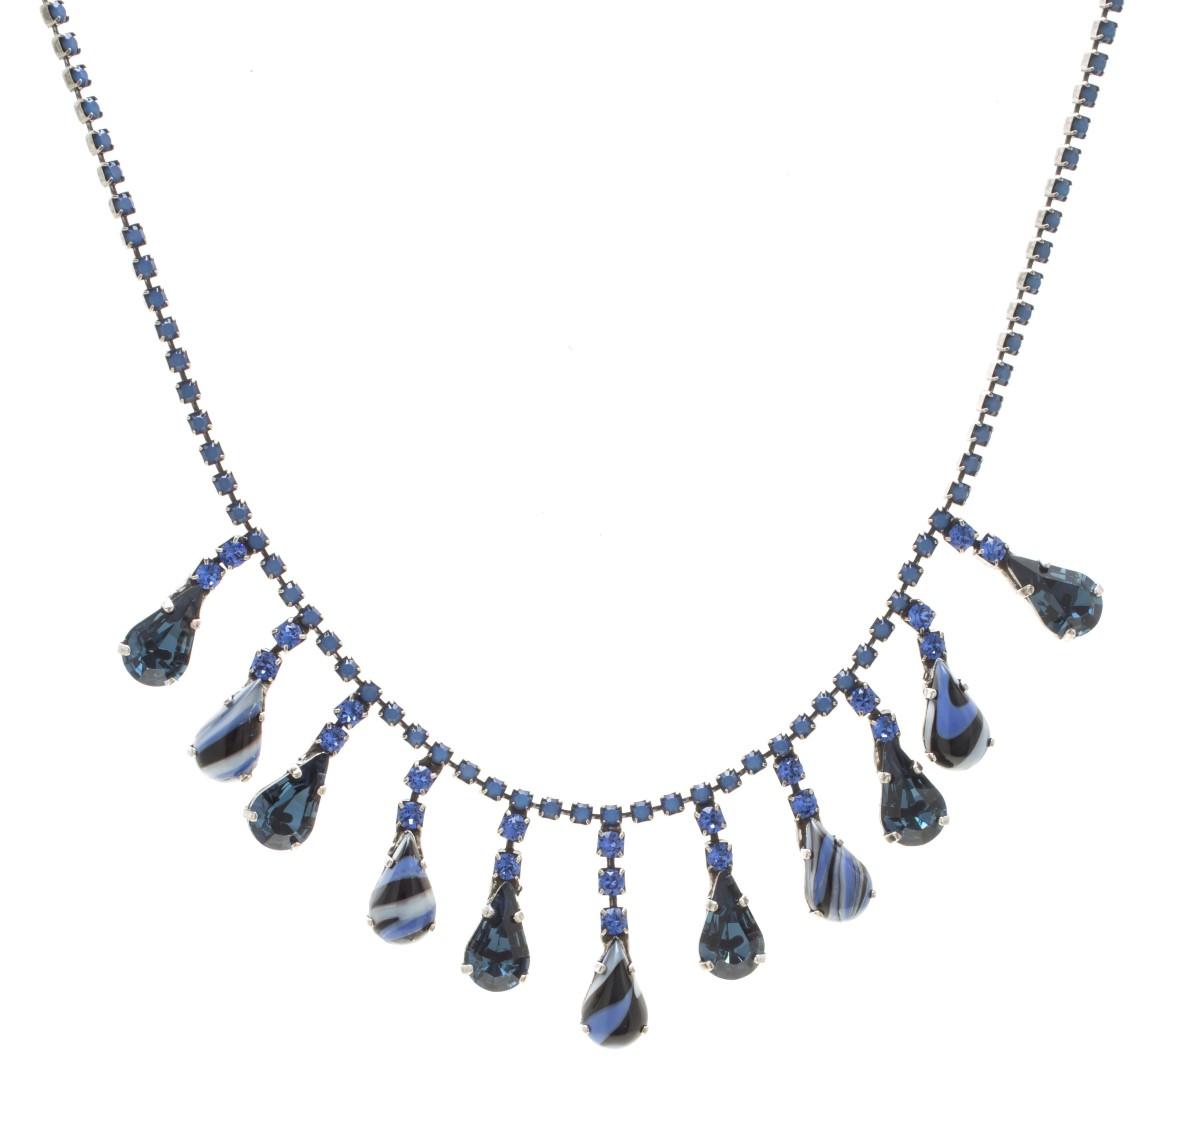 ARTWEAR DIMITRIADIS – Γυναικείο κολιέ ARTWEAR DIMITRIADIS μπλε με στρας και  πέτρες. Factory Outlet 2fcb662d2a2